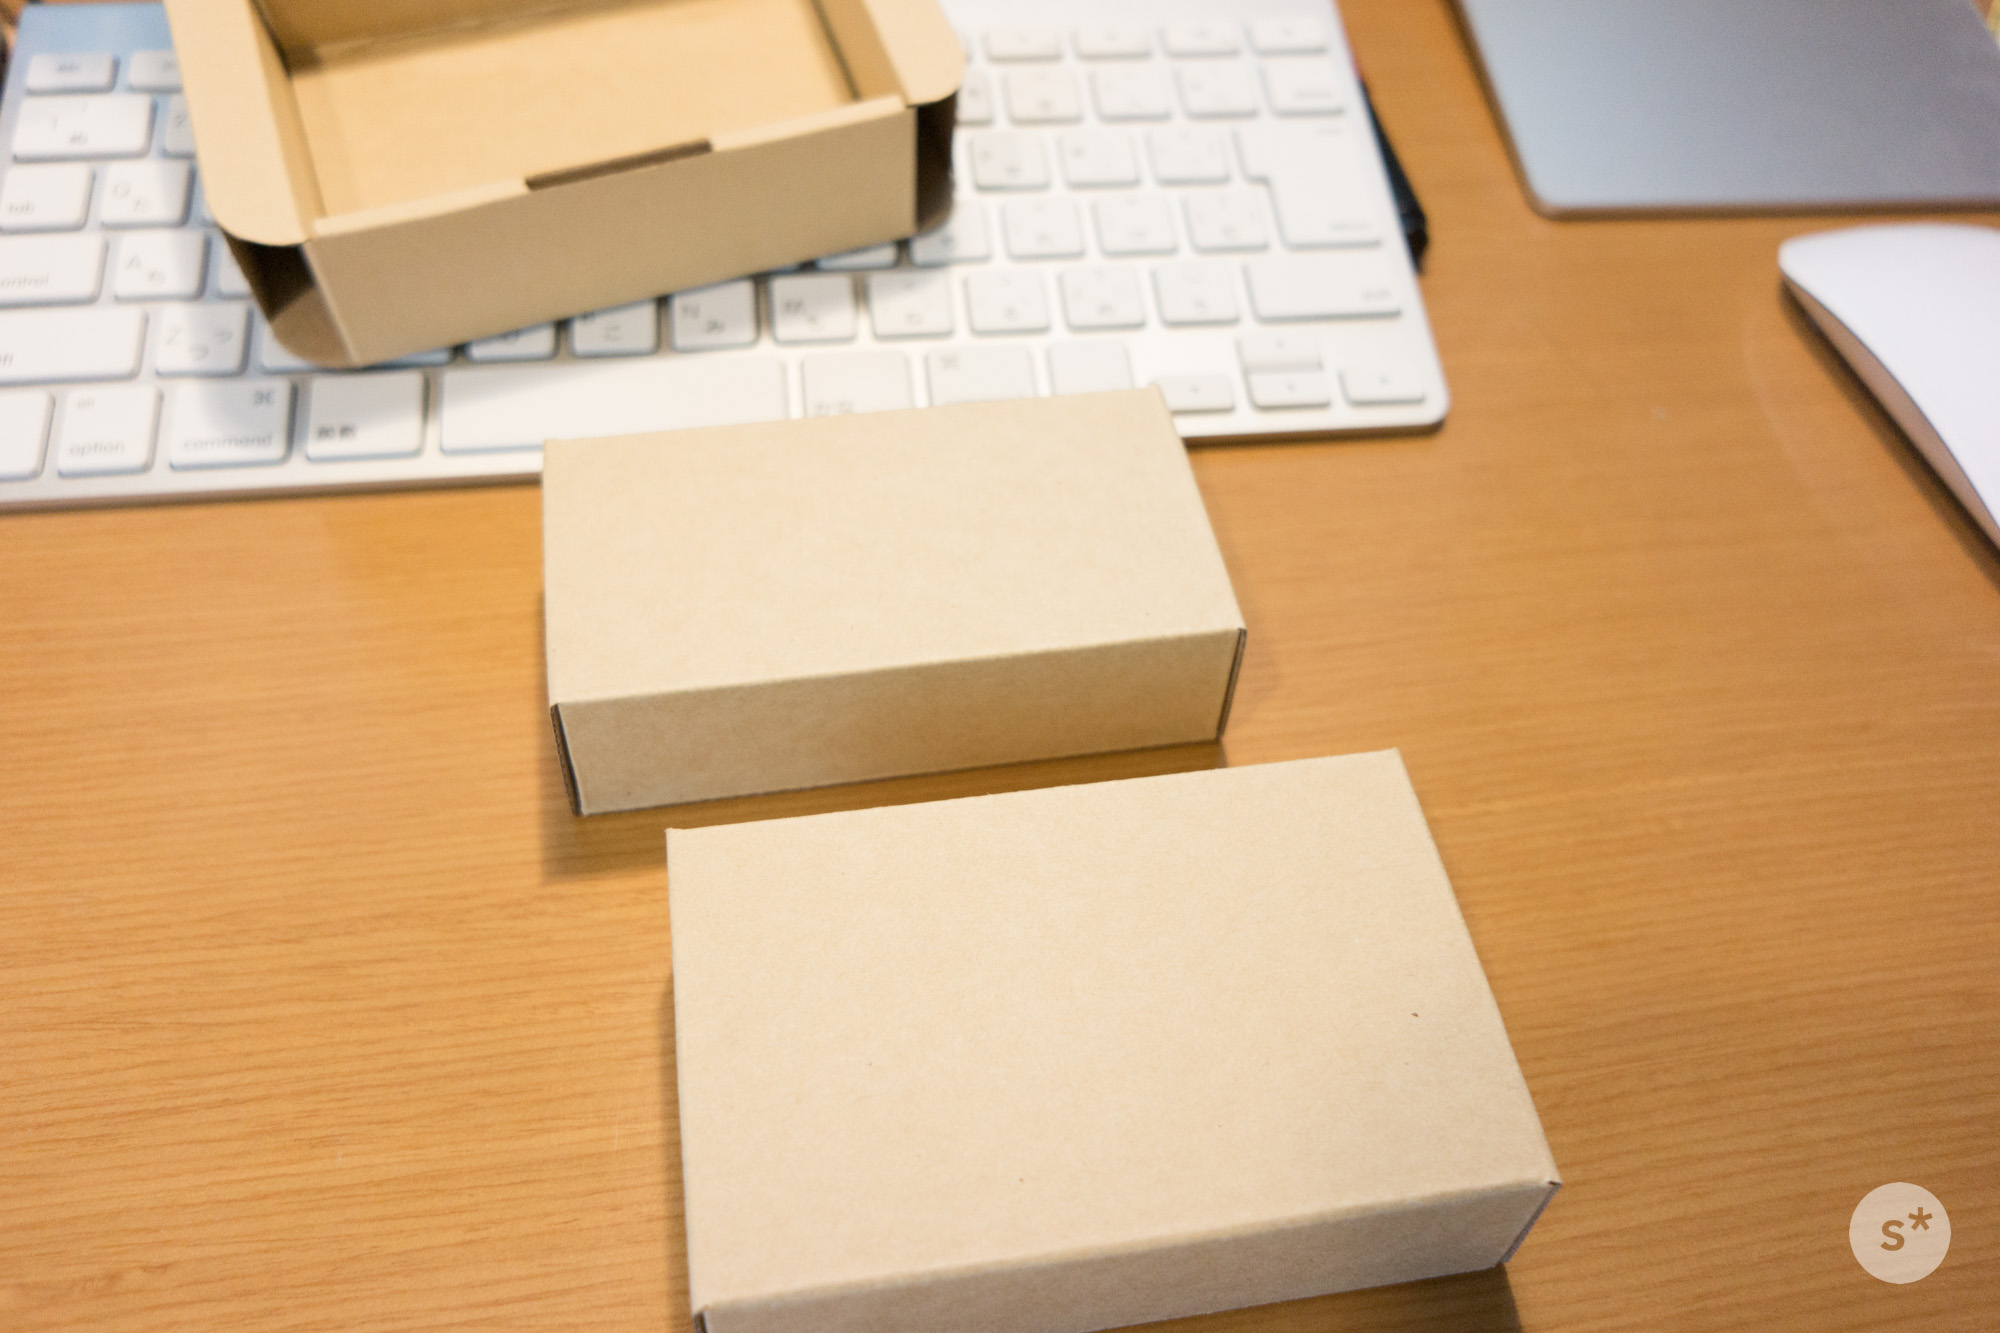 QY8_box